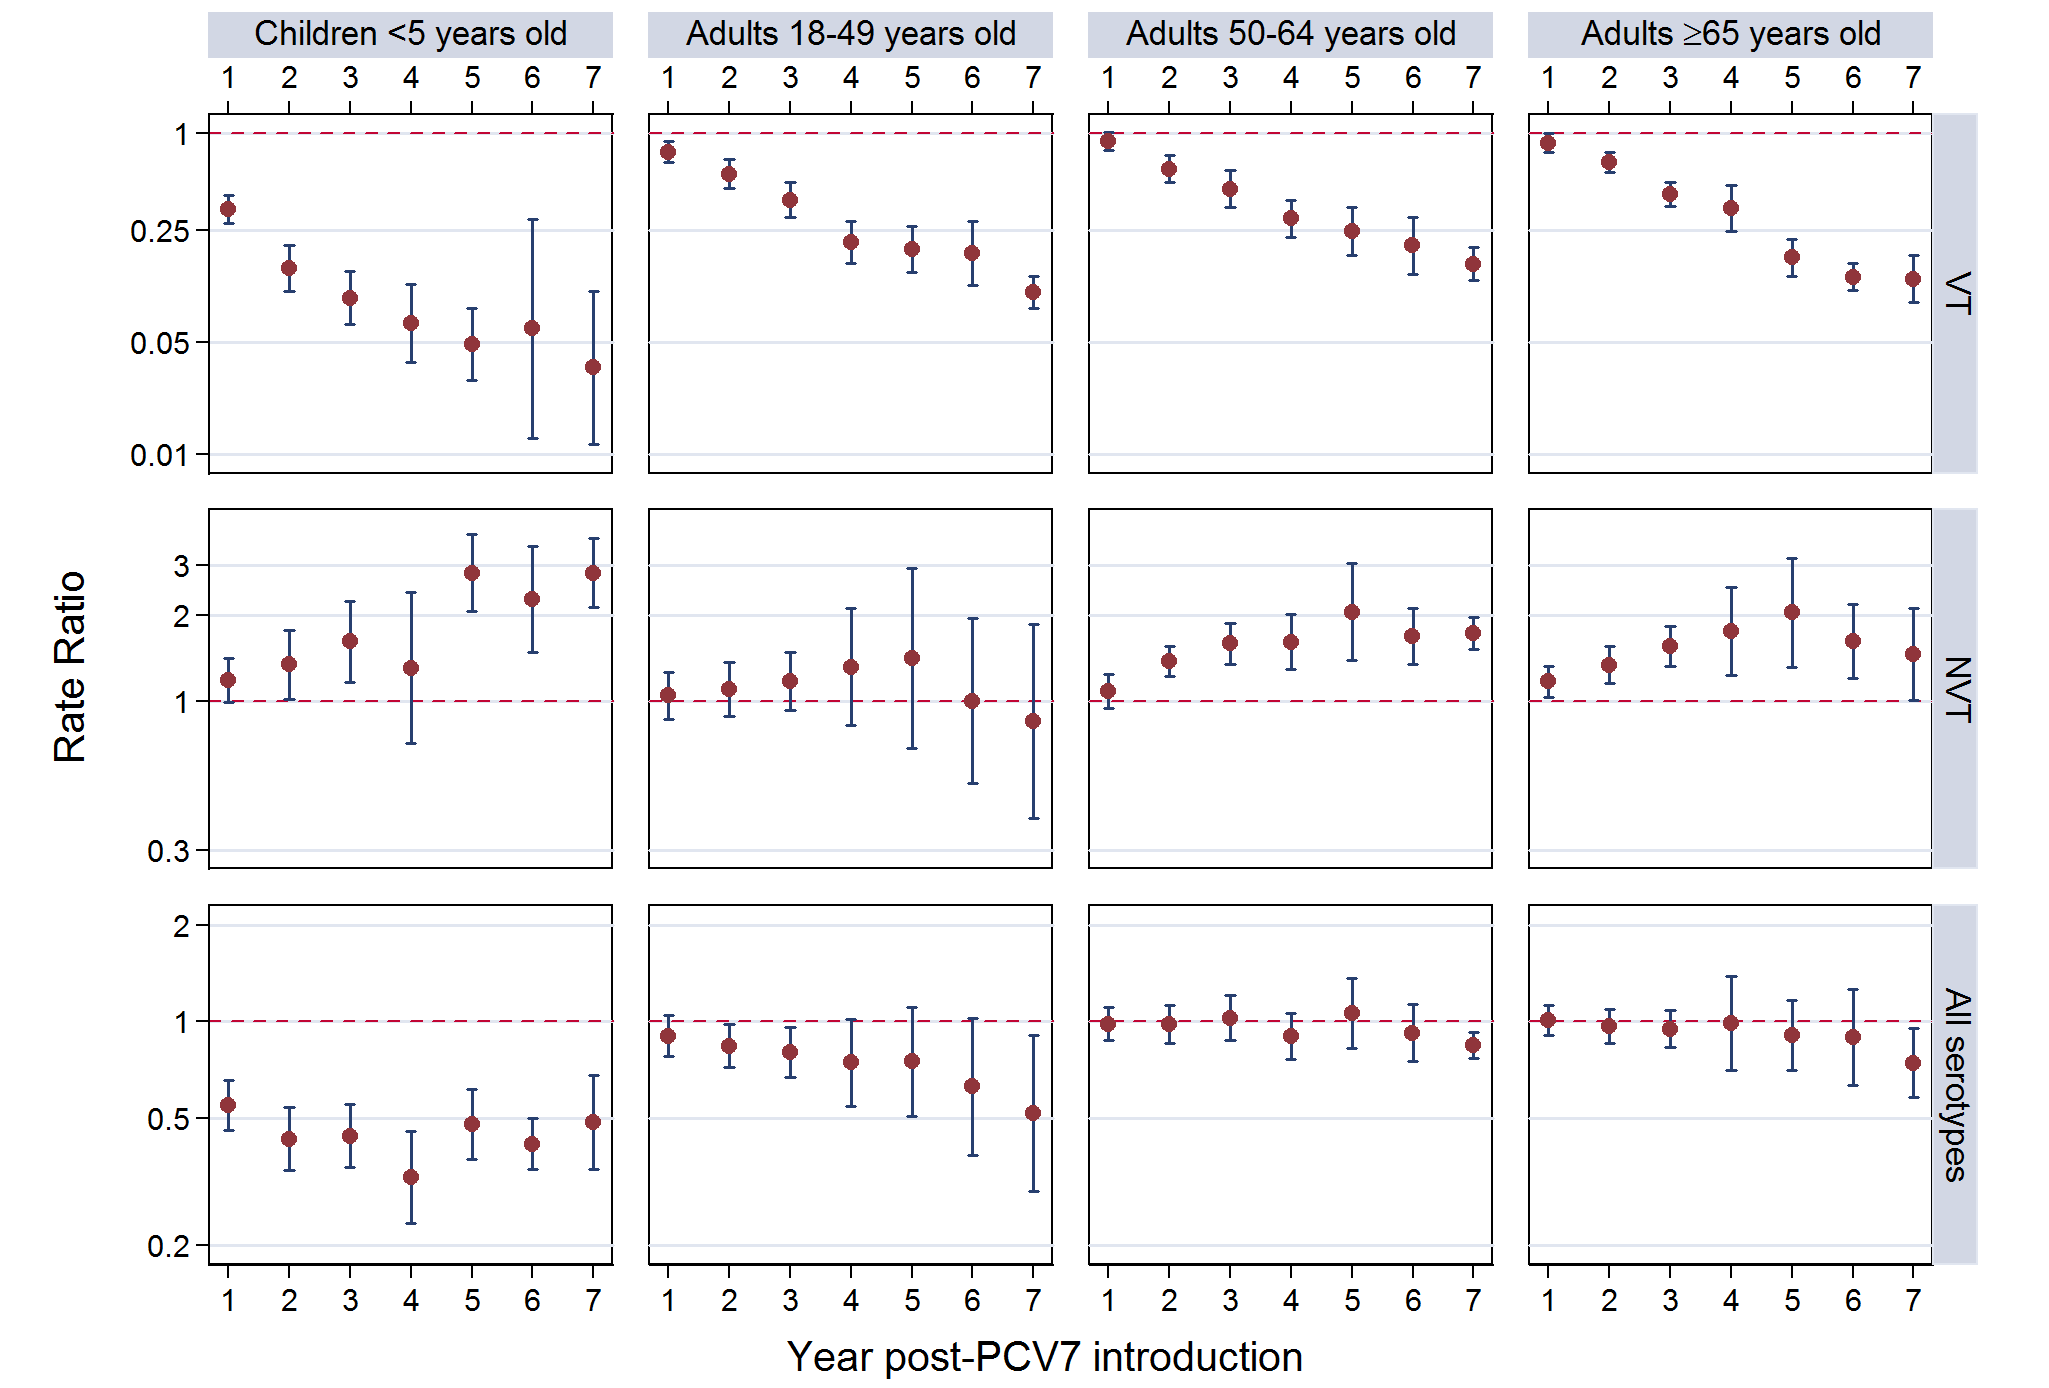 Post-PCV7 introduction invasive pneumococcal disease summary rate ratios.